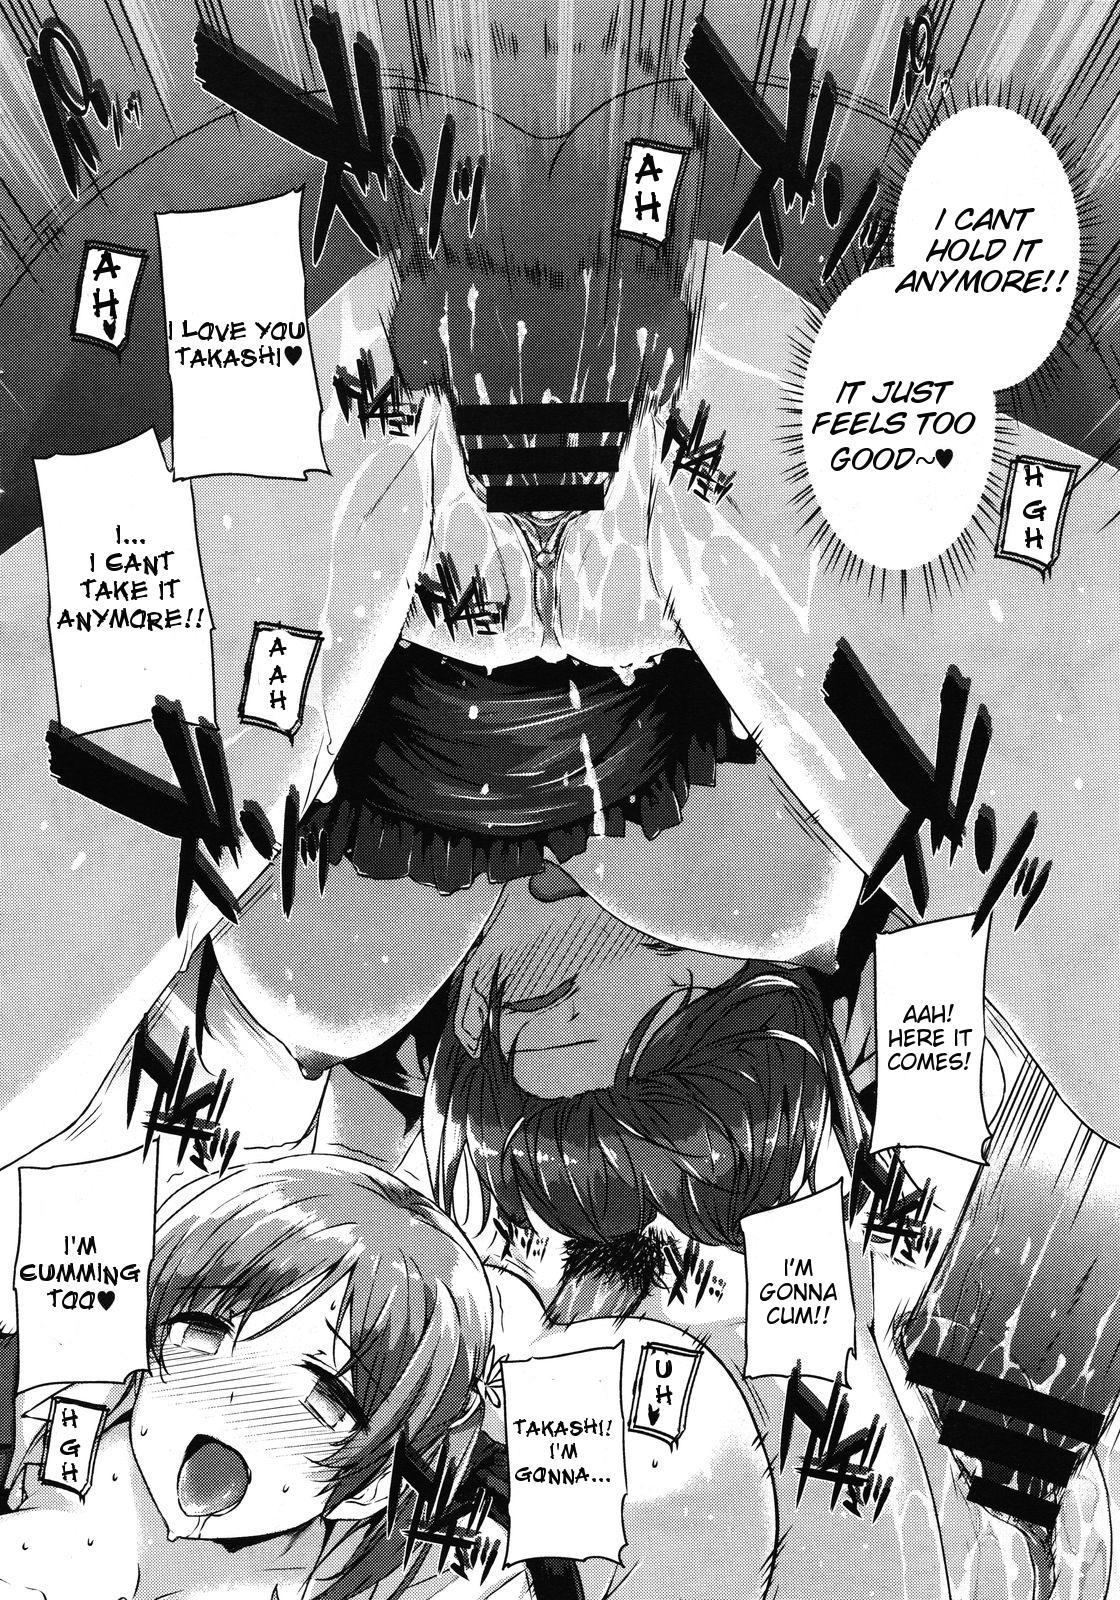 [Katsurai Yoshiaki] Kanojo wa Kazoku de Koibito de Ch. 1-3   She's My Family And My Lover Ch. 1-3 [English] {doujin-moe.us} 25